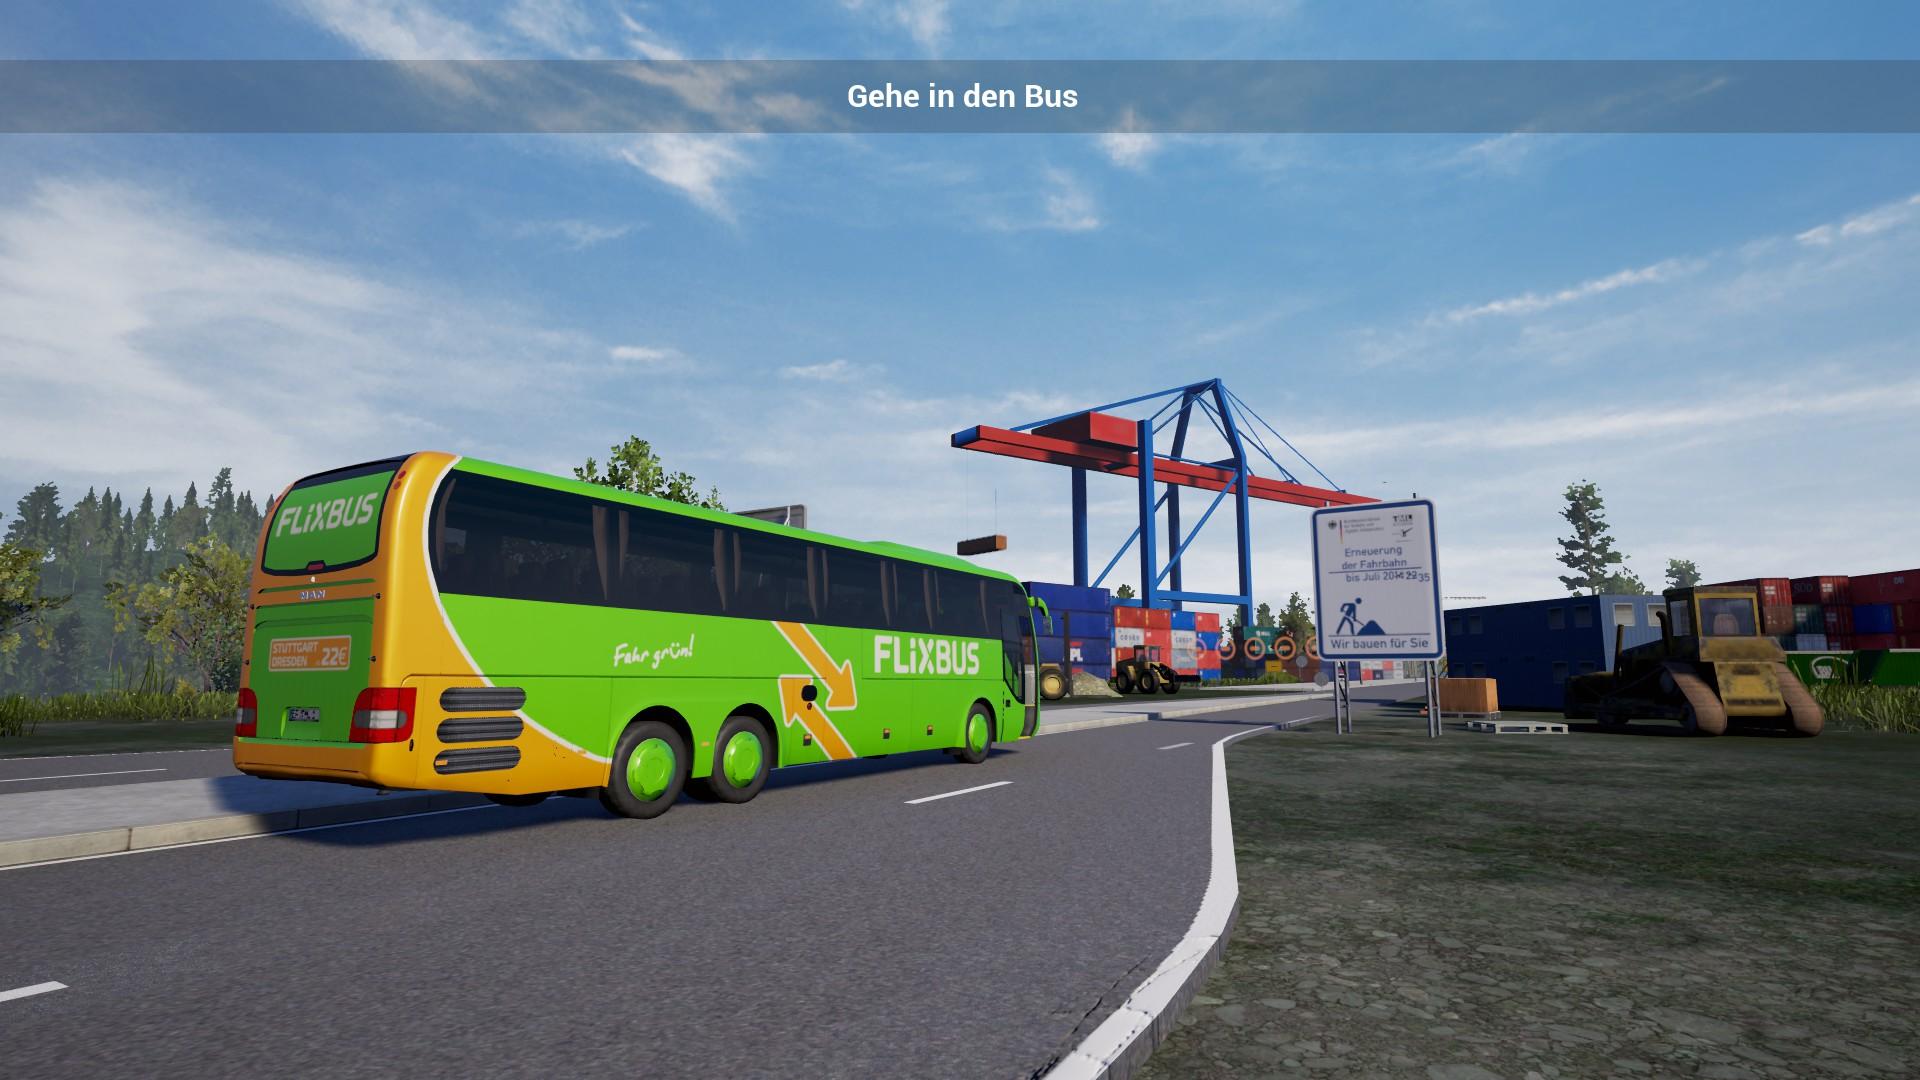 fernbus coach simulator 1 4 g ncellemesi yay nland. Black Bedroom Furniture Sets. Home Design Ideas